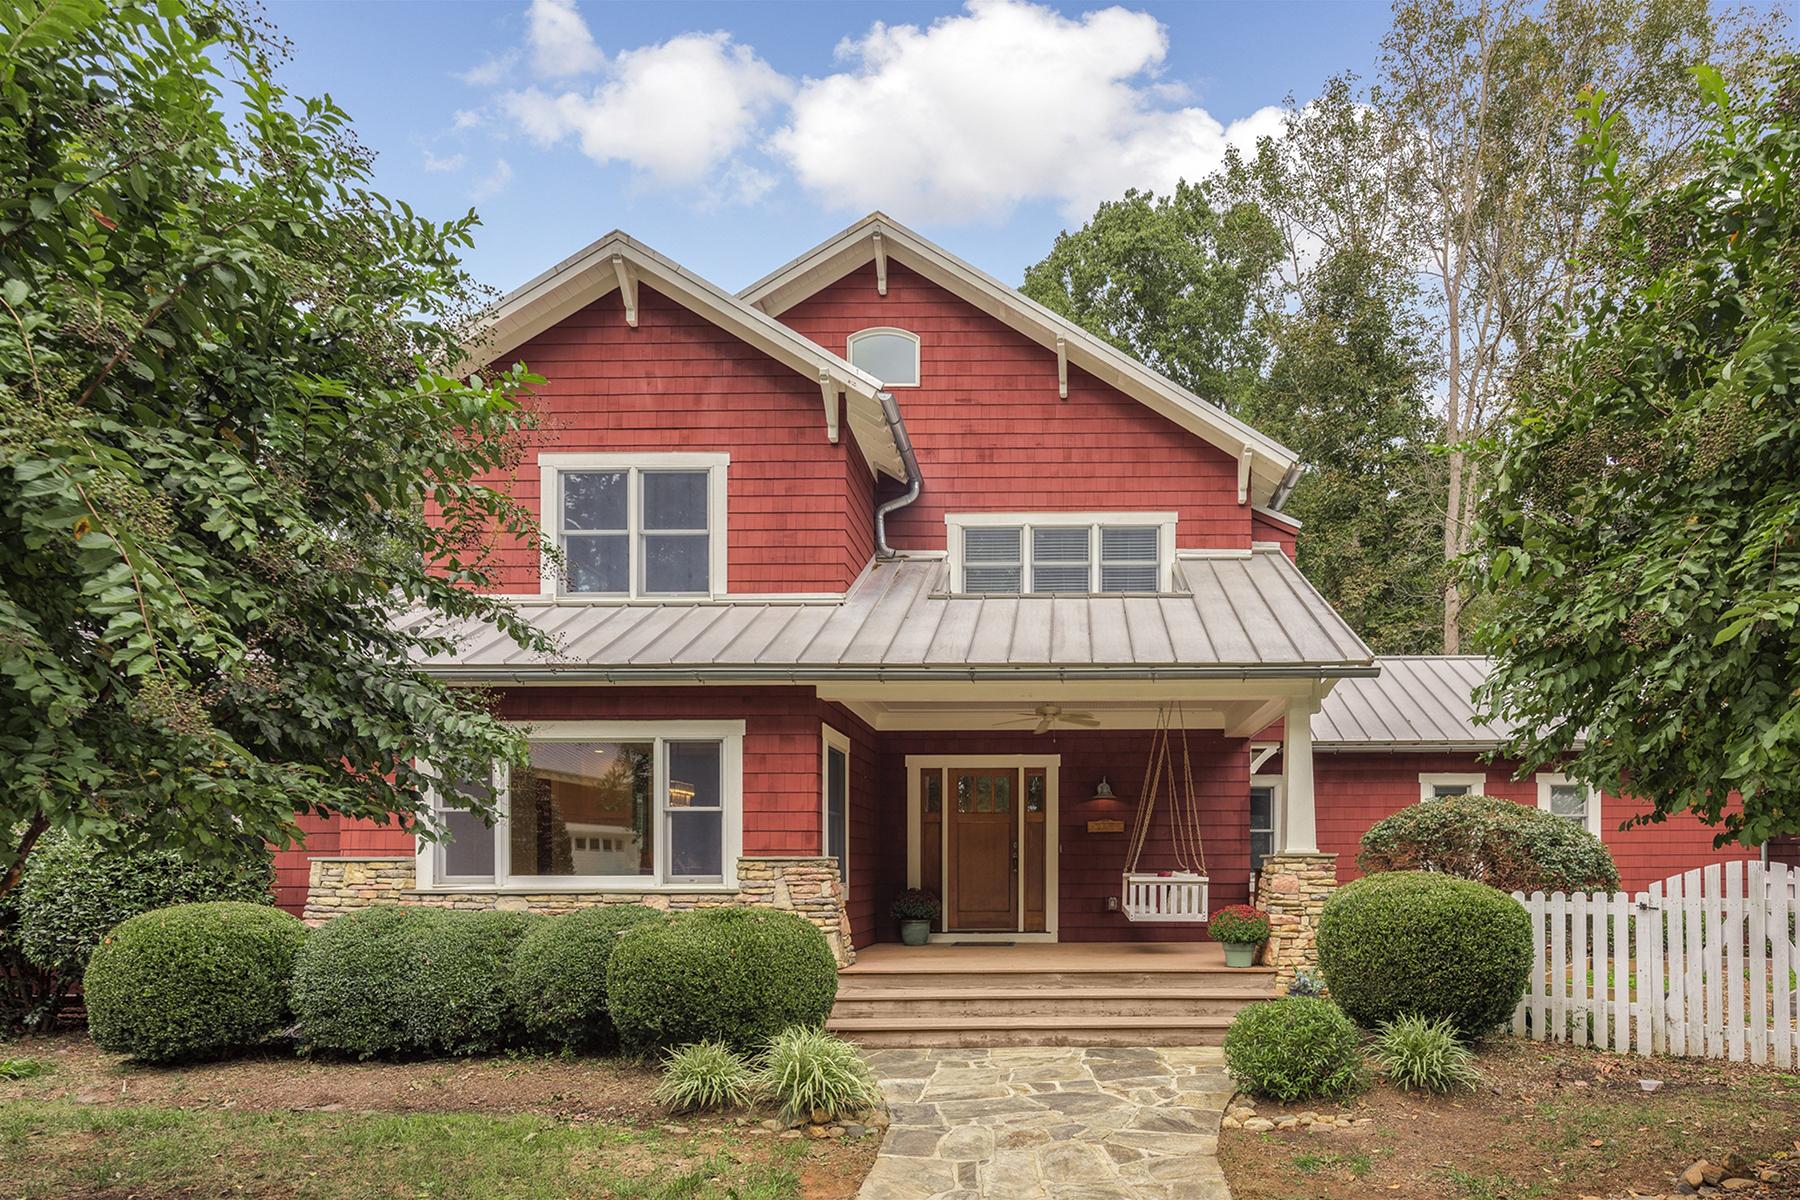 Single Family Home for Active at 2615 Grey Rd Davidson, North Carolina 28036 United States